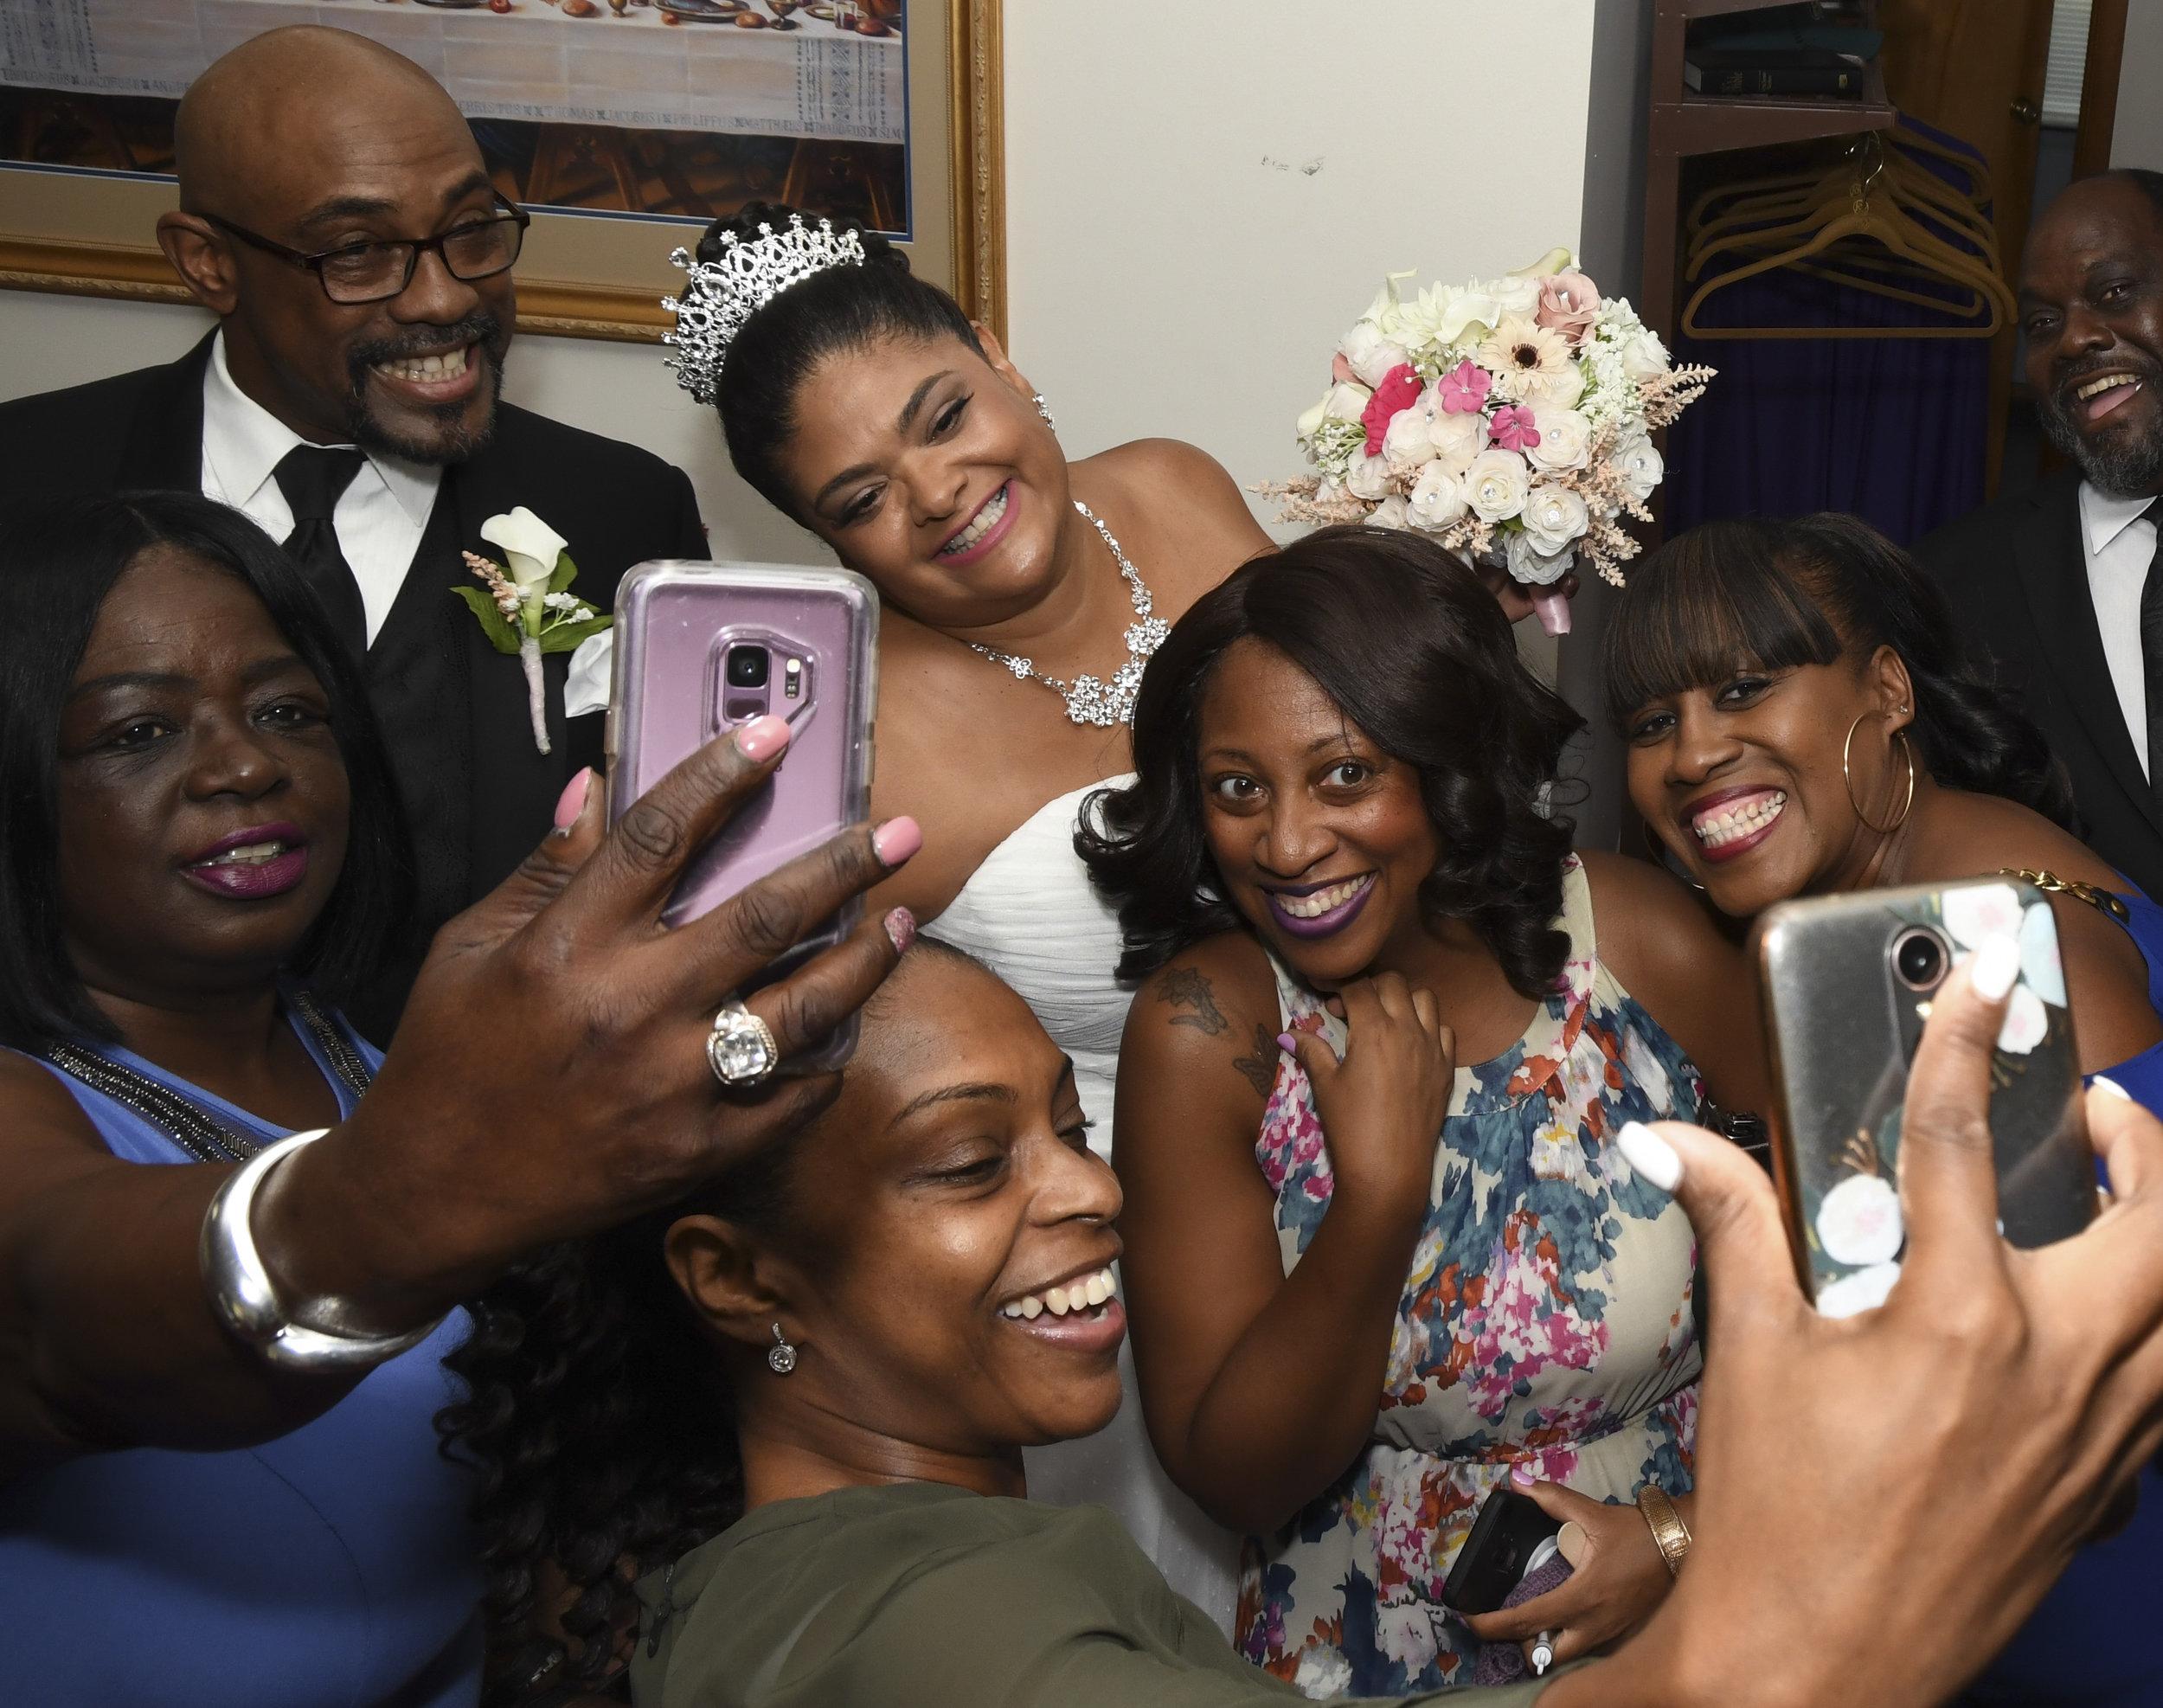 2018 09.01.18 Robin and Buck's Wedding  Felix Bryant Photography, LLC  ©201820180901_0093.jpg